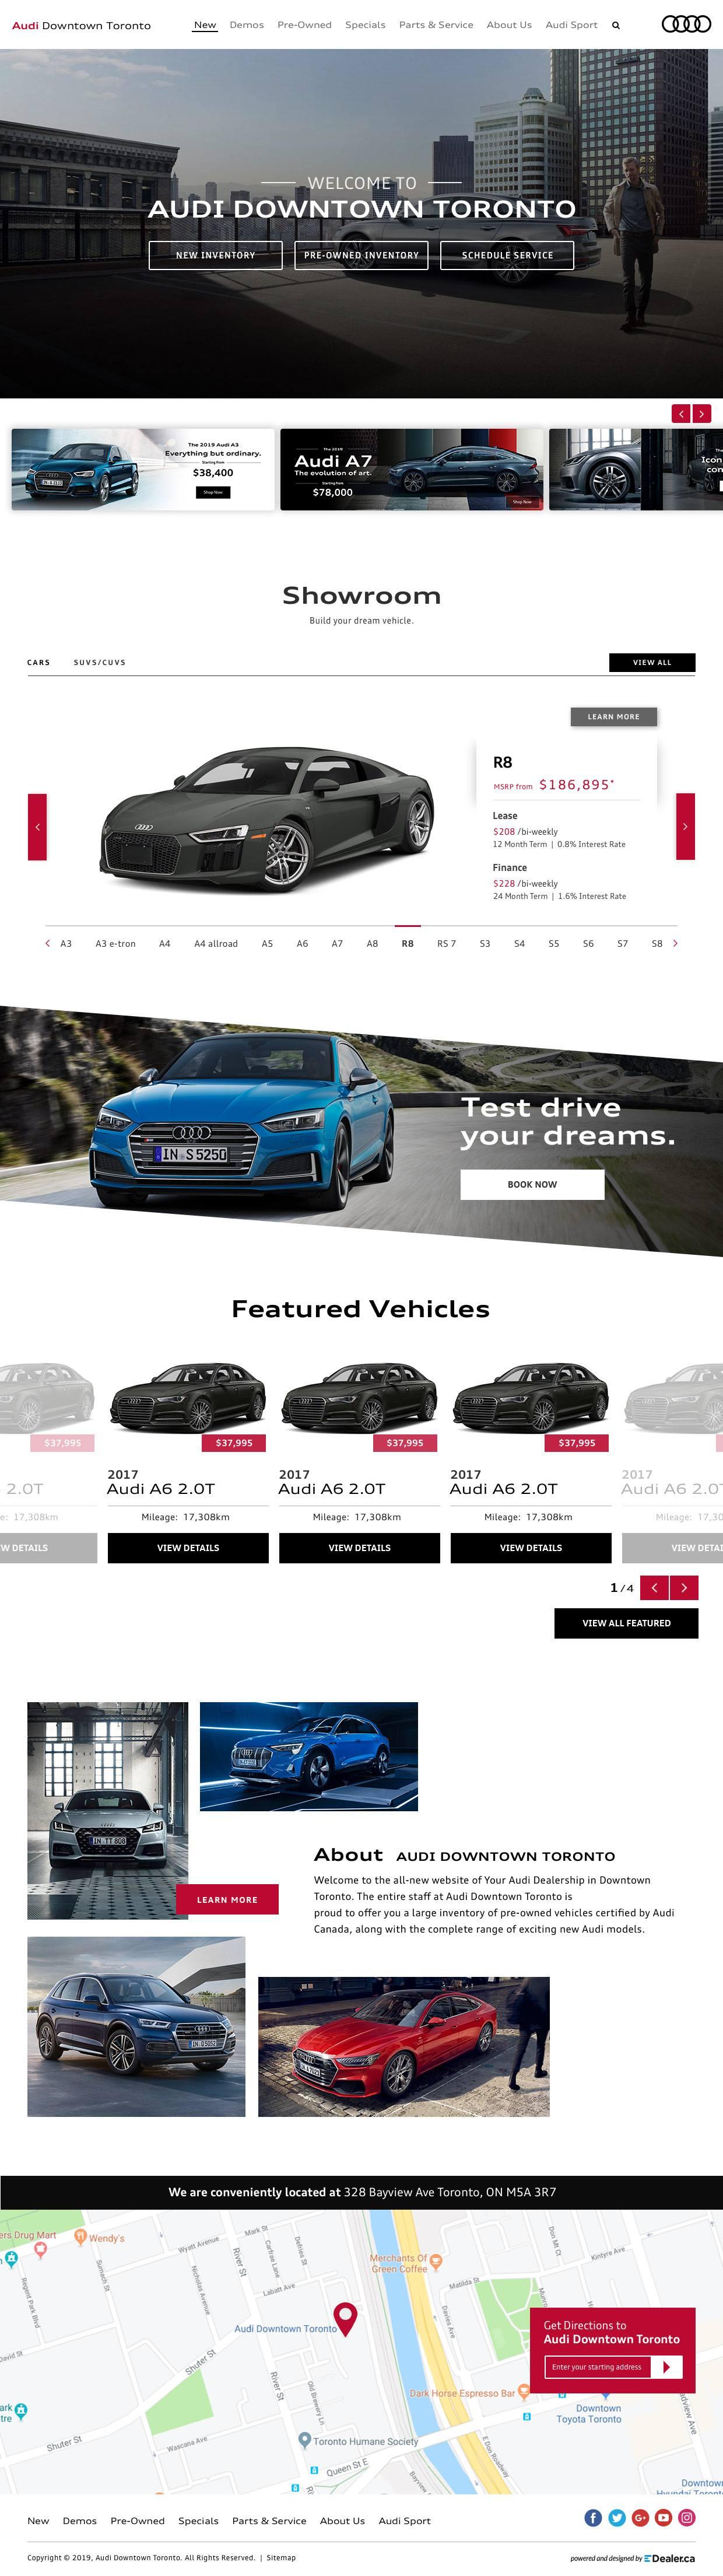 Audi Downtown Toronto